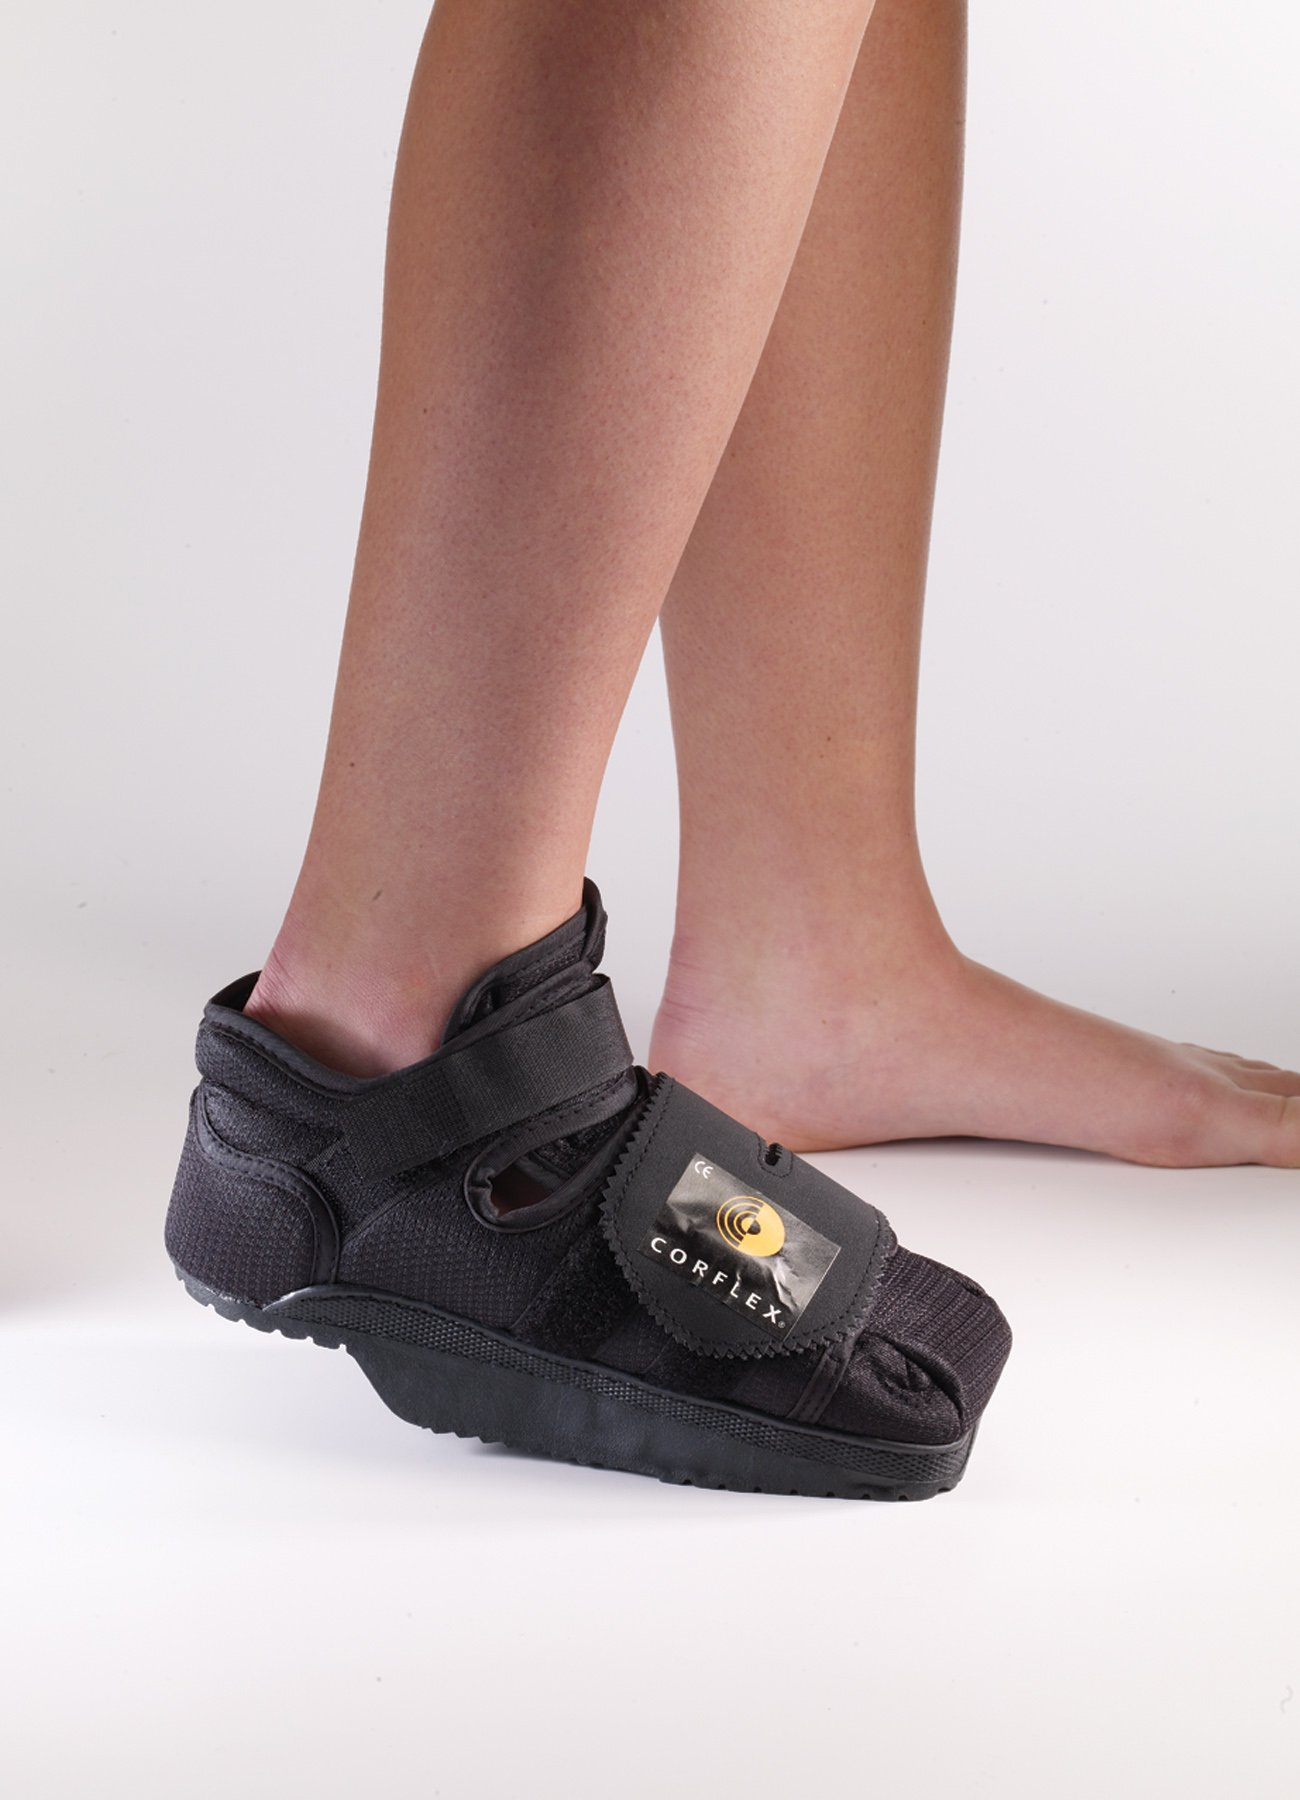 Foot Care Heel Wedge Healing Shoe - Large